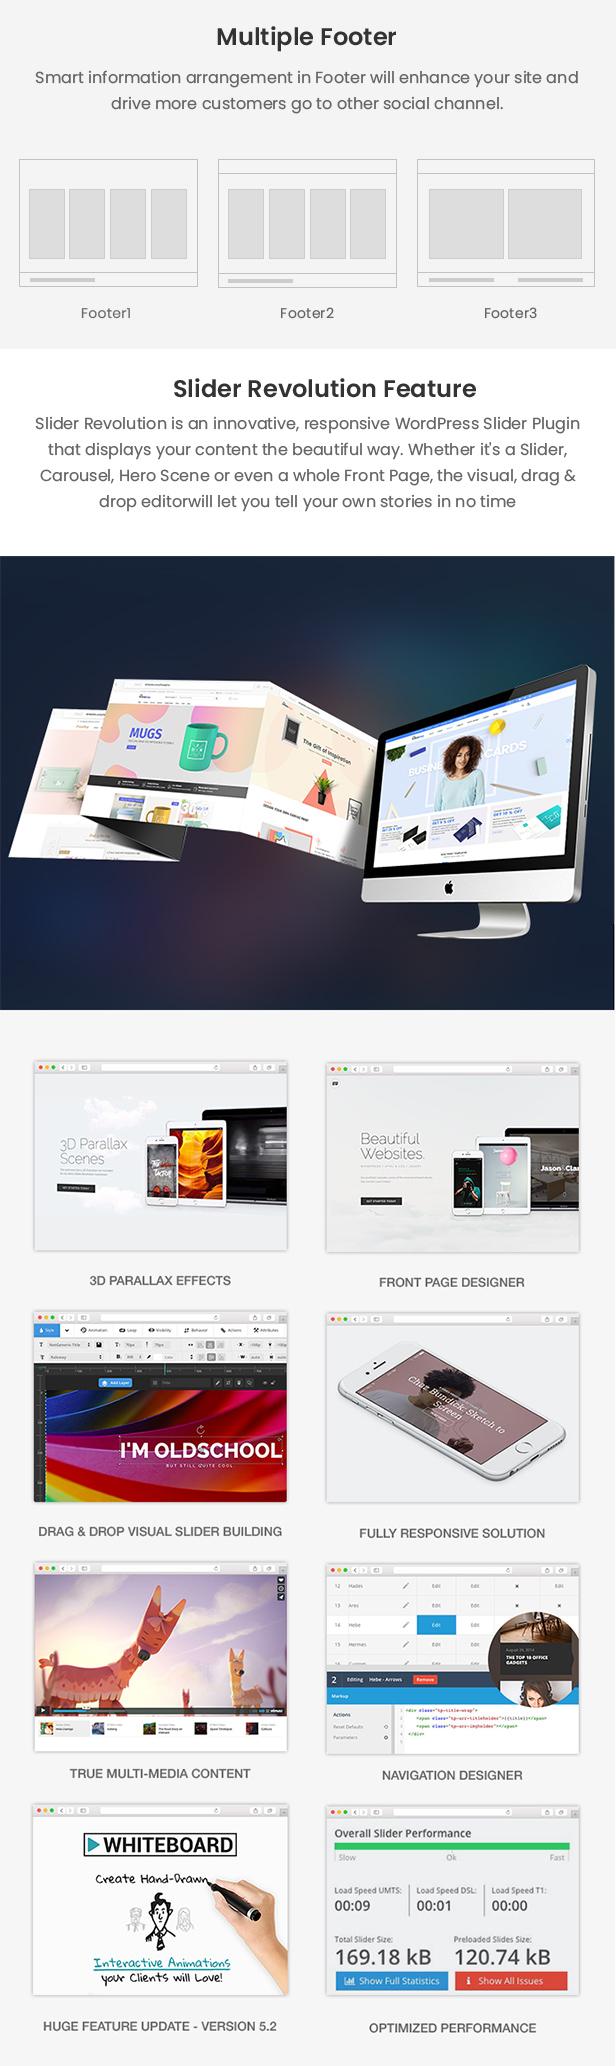 Printshop - Responsive Magento Printing Theme - 11